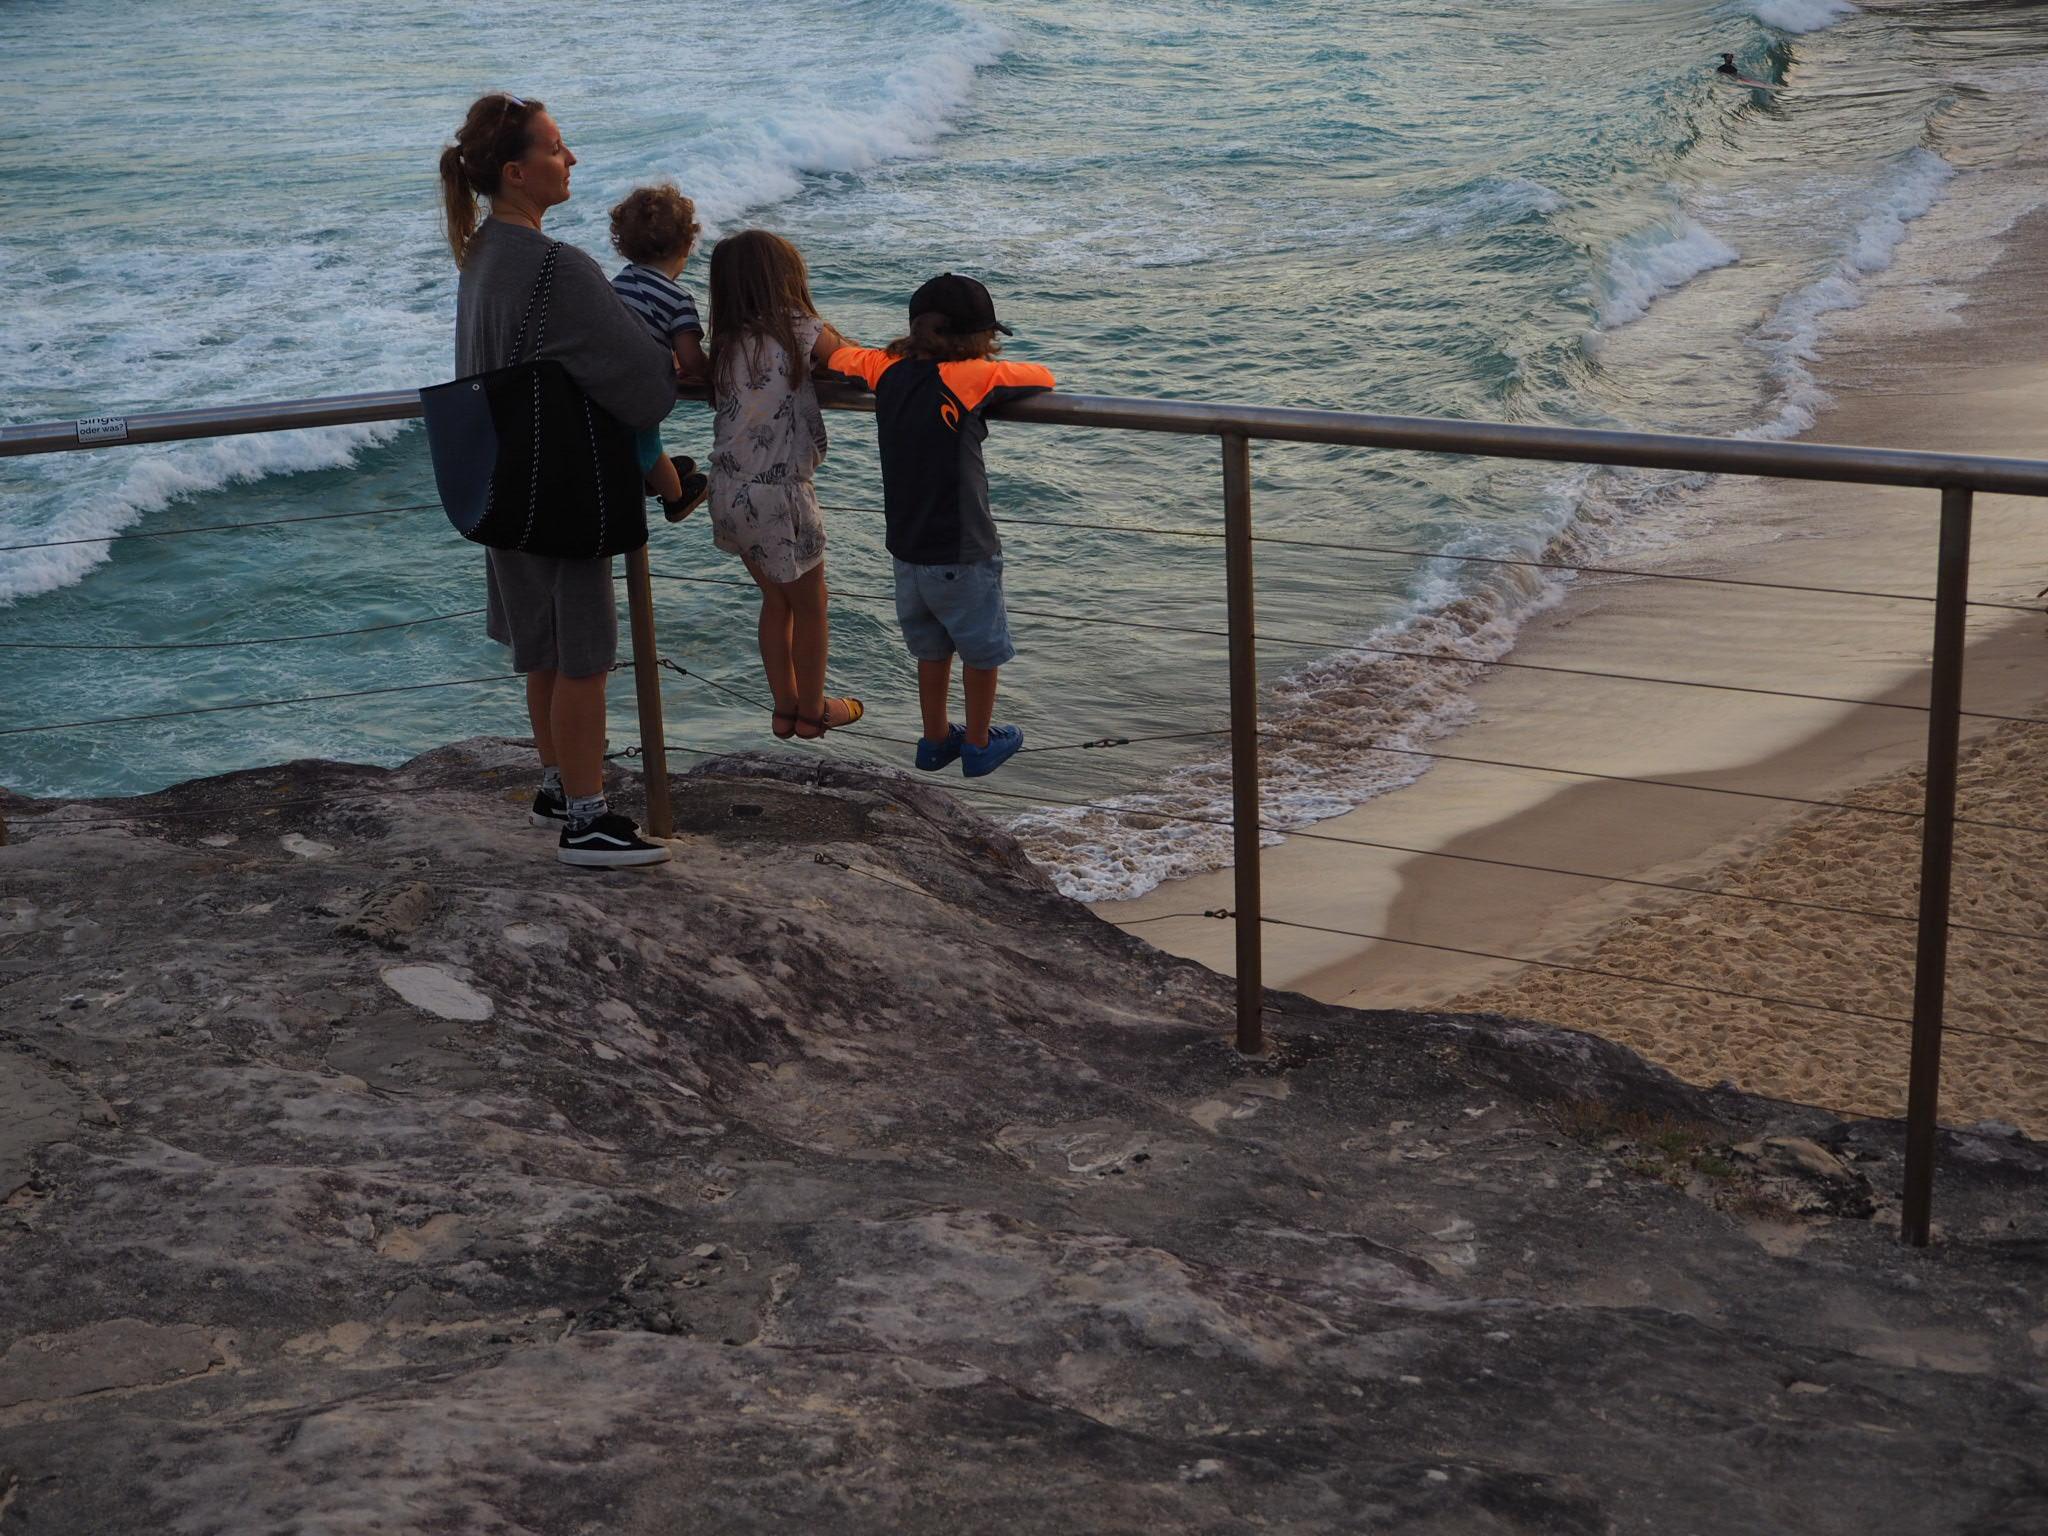 Bondi to Bronte, Australia